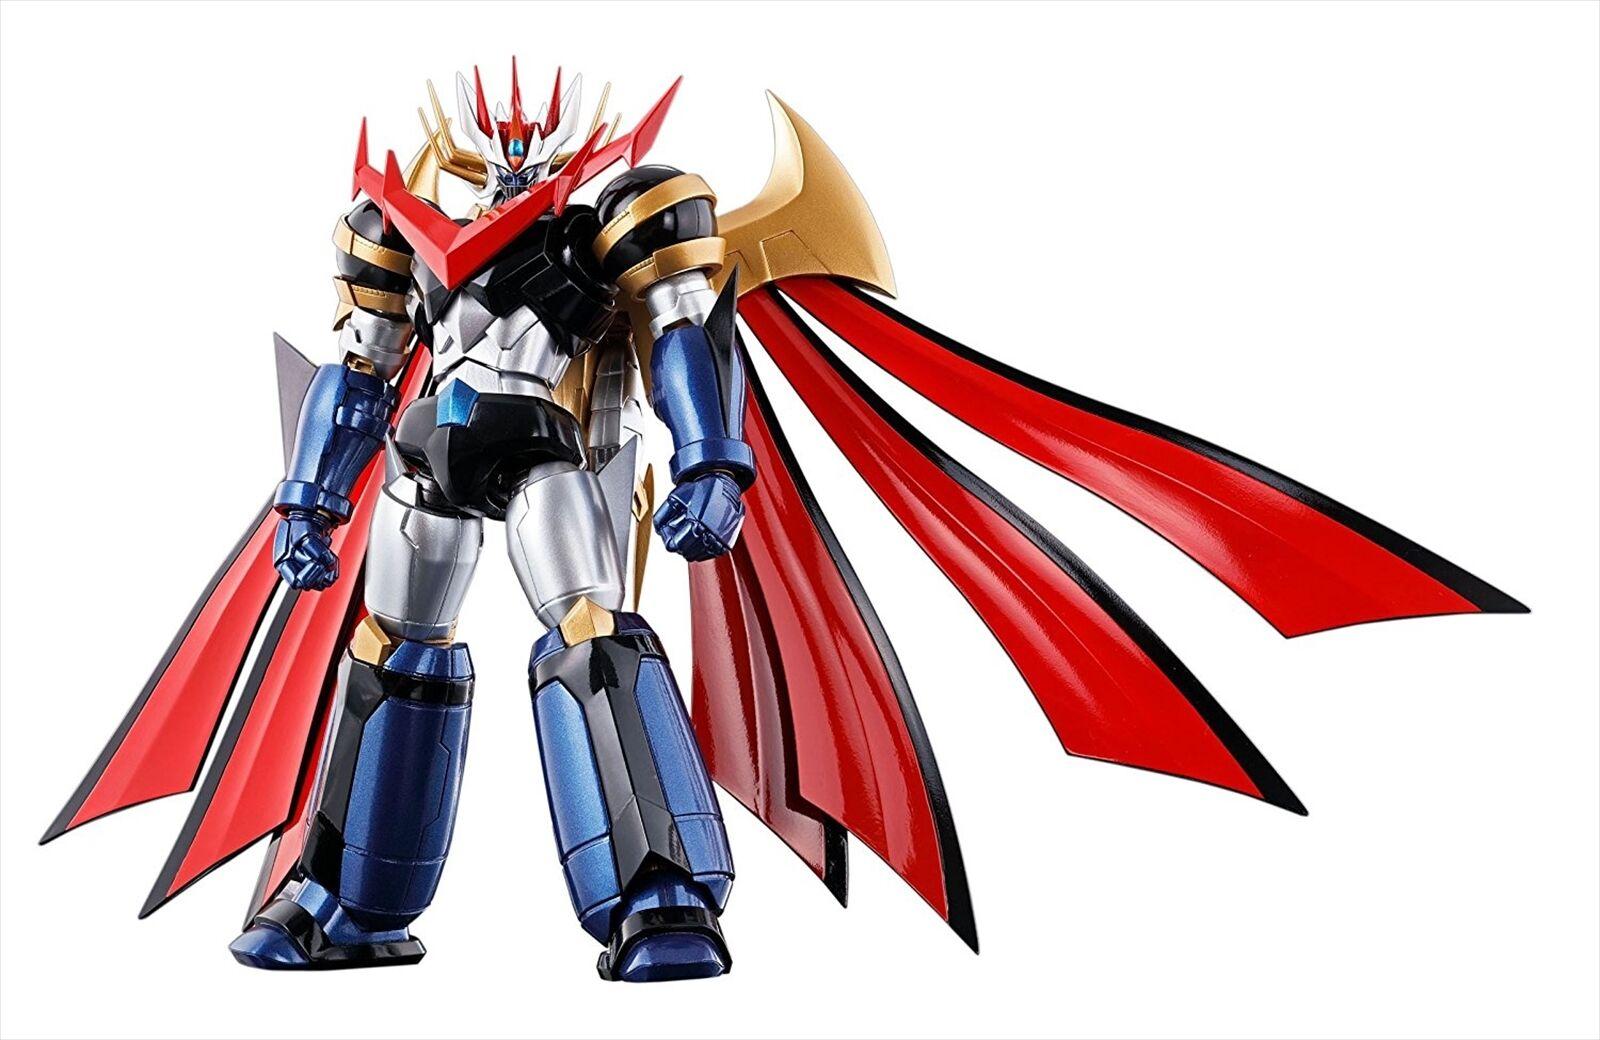 Bandai Tamashii Nations Chogokin mazinemperor G súper Robot Wars V Figura De Acción